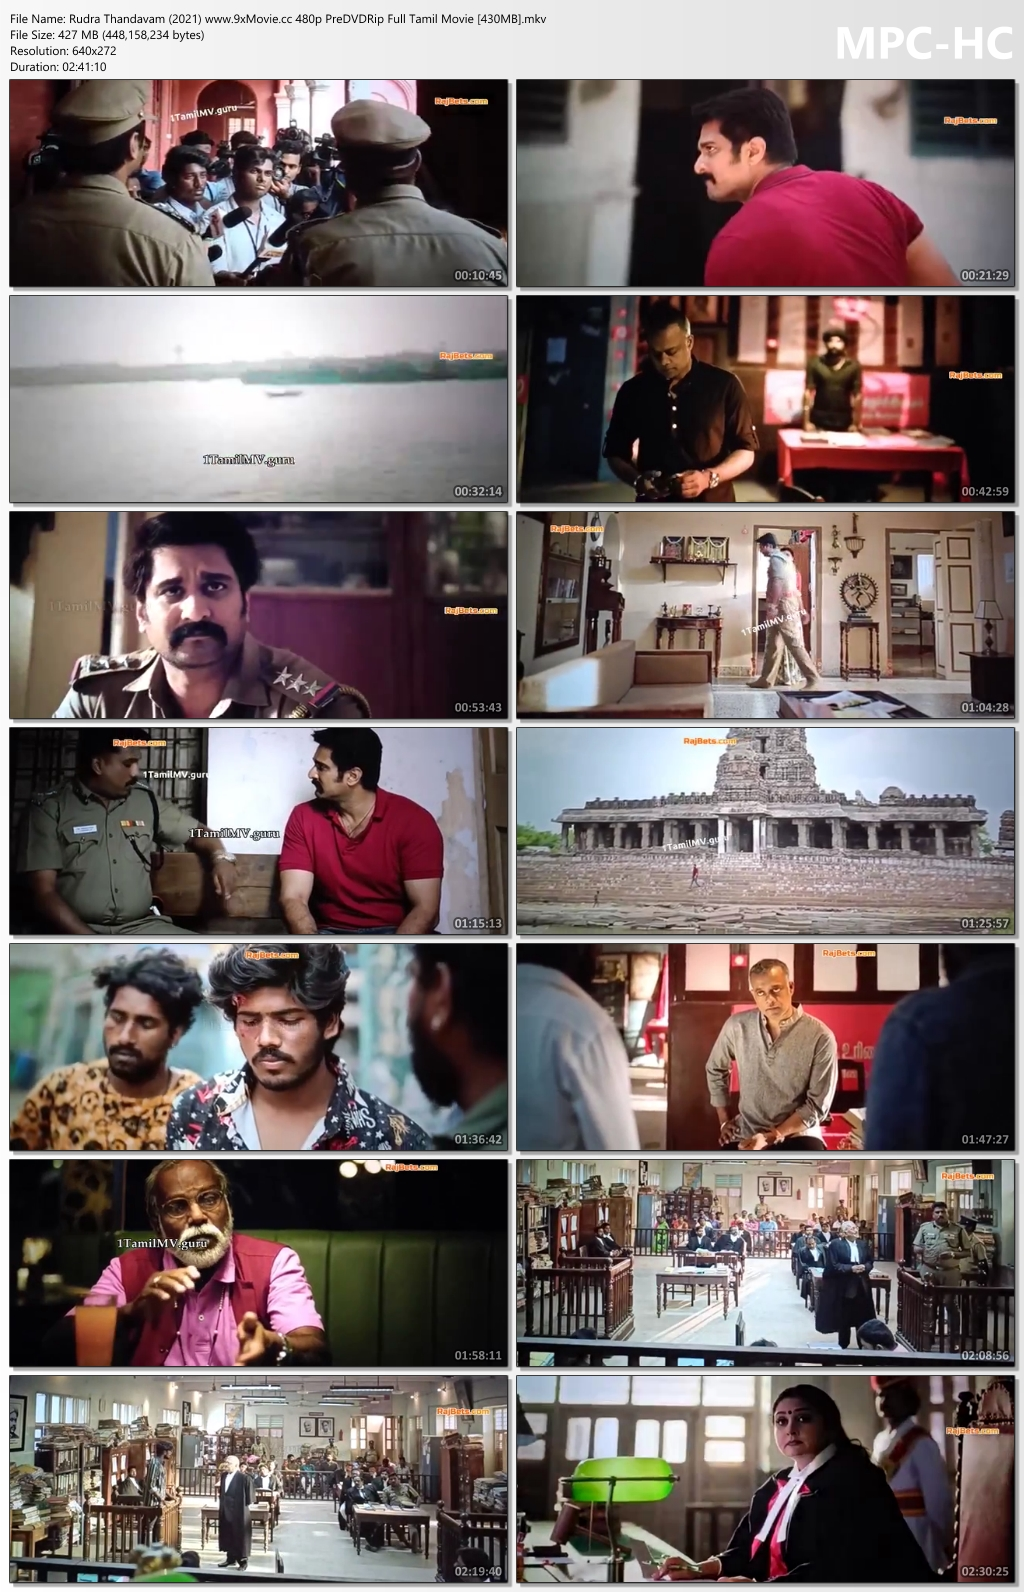 Rudra-Thandavam-2021-www-9x-Movie-cc-480p-Pre-DVDRip-Full-Tamil-Movie-430-MB-mkv